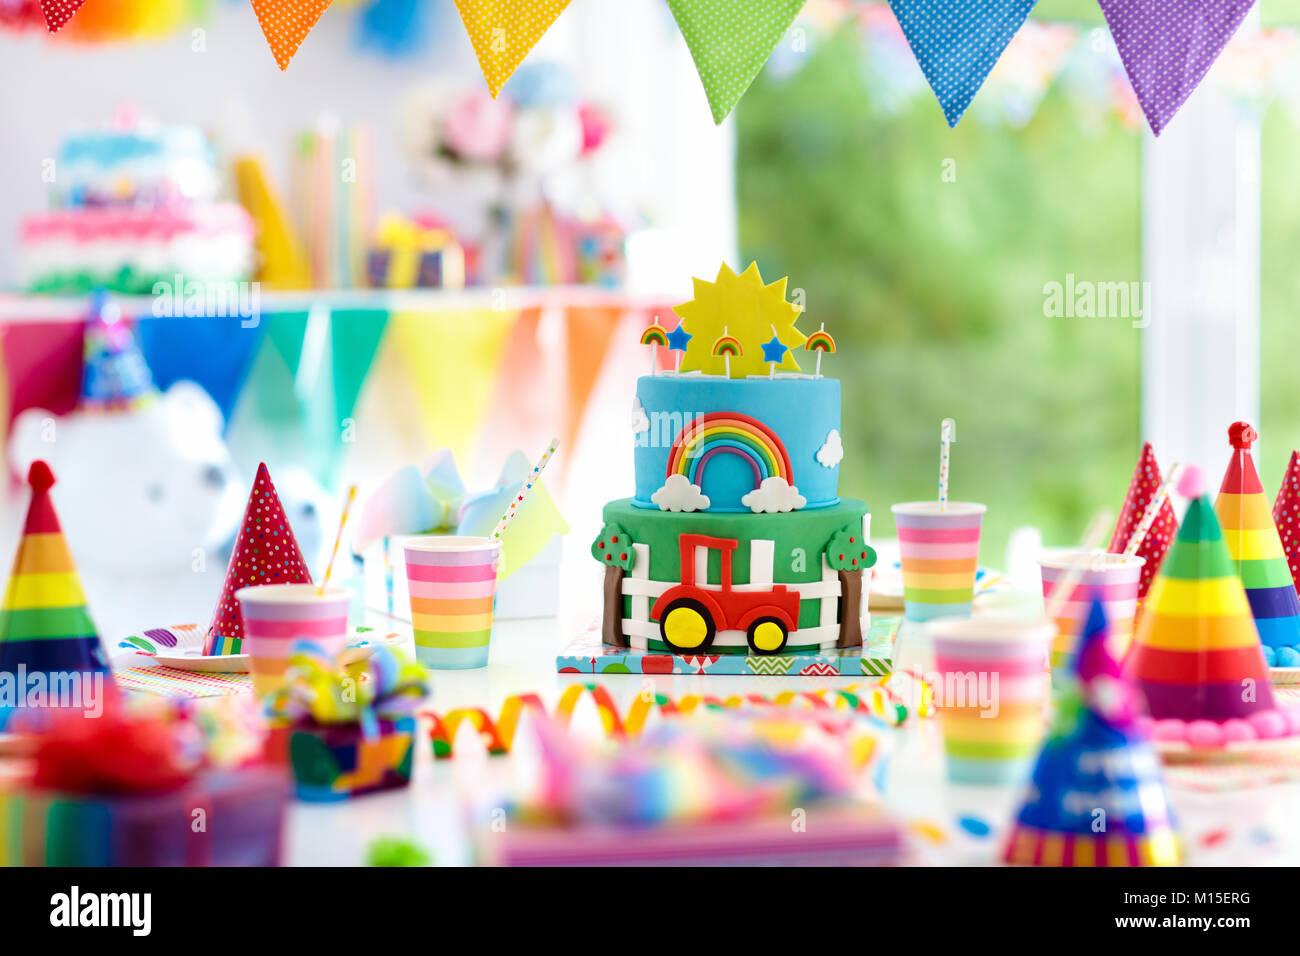 Fiesta de cumplea os para ni os decoraci n colorido - Bizcocho cumpleanos para ninos ...